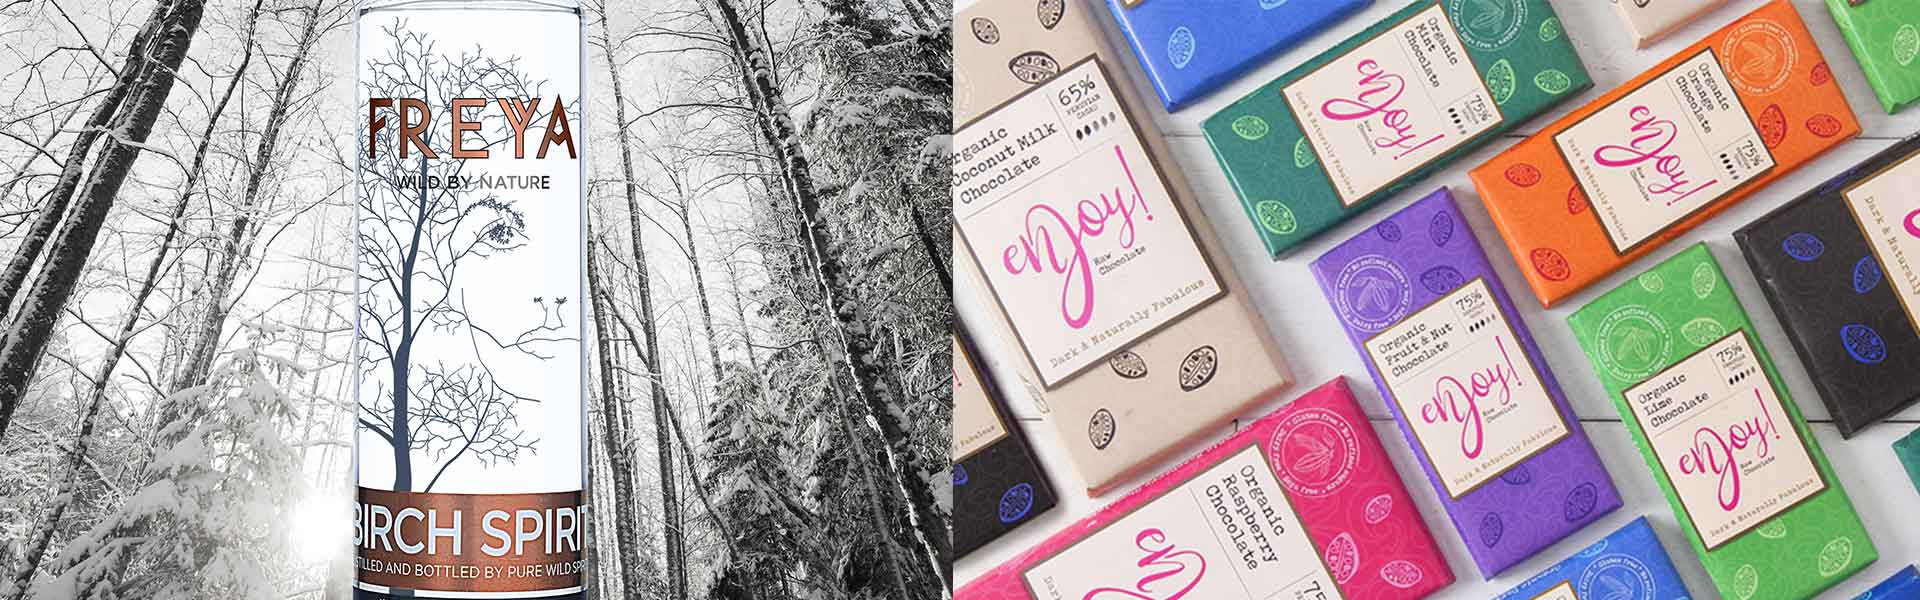 Growthdeck: Enjoy Raw Chocolate and Freya Drinks Reception